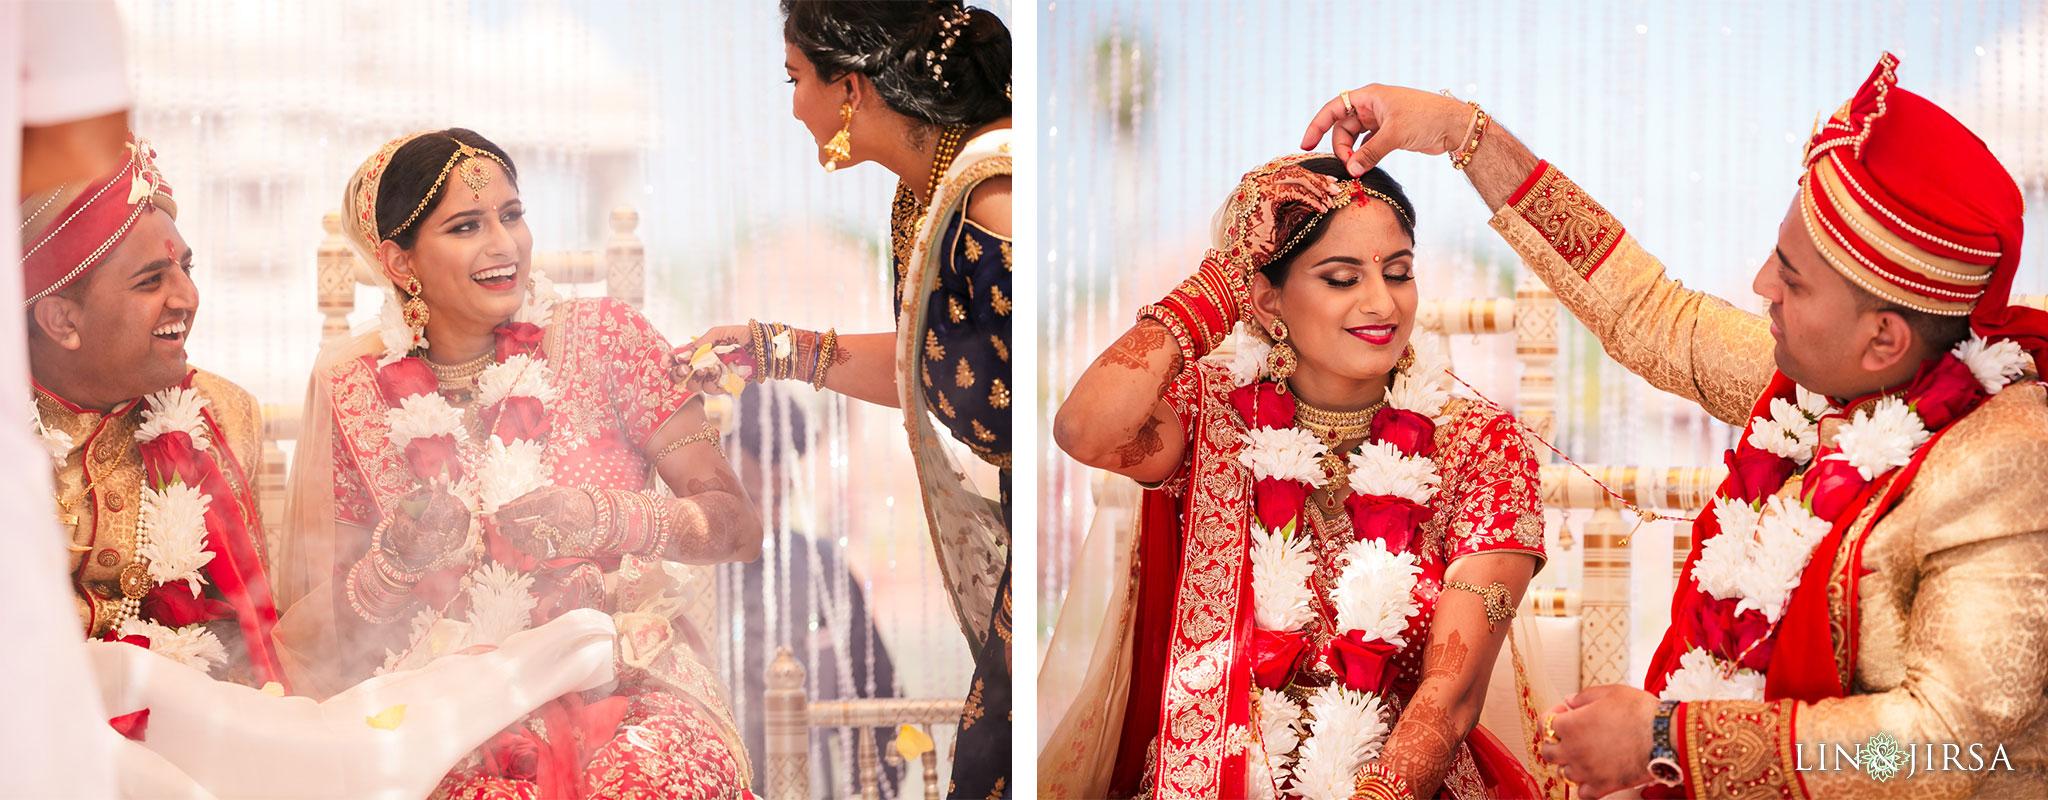 089 BAPS Swaminarayan Sanstha Chino Hills Indian Wedding Photography